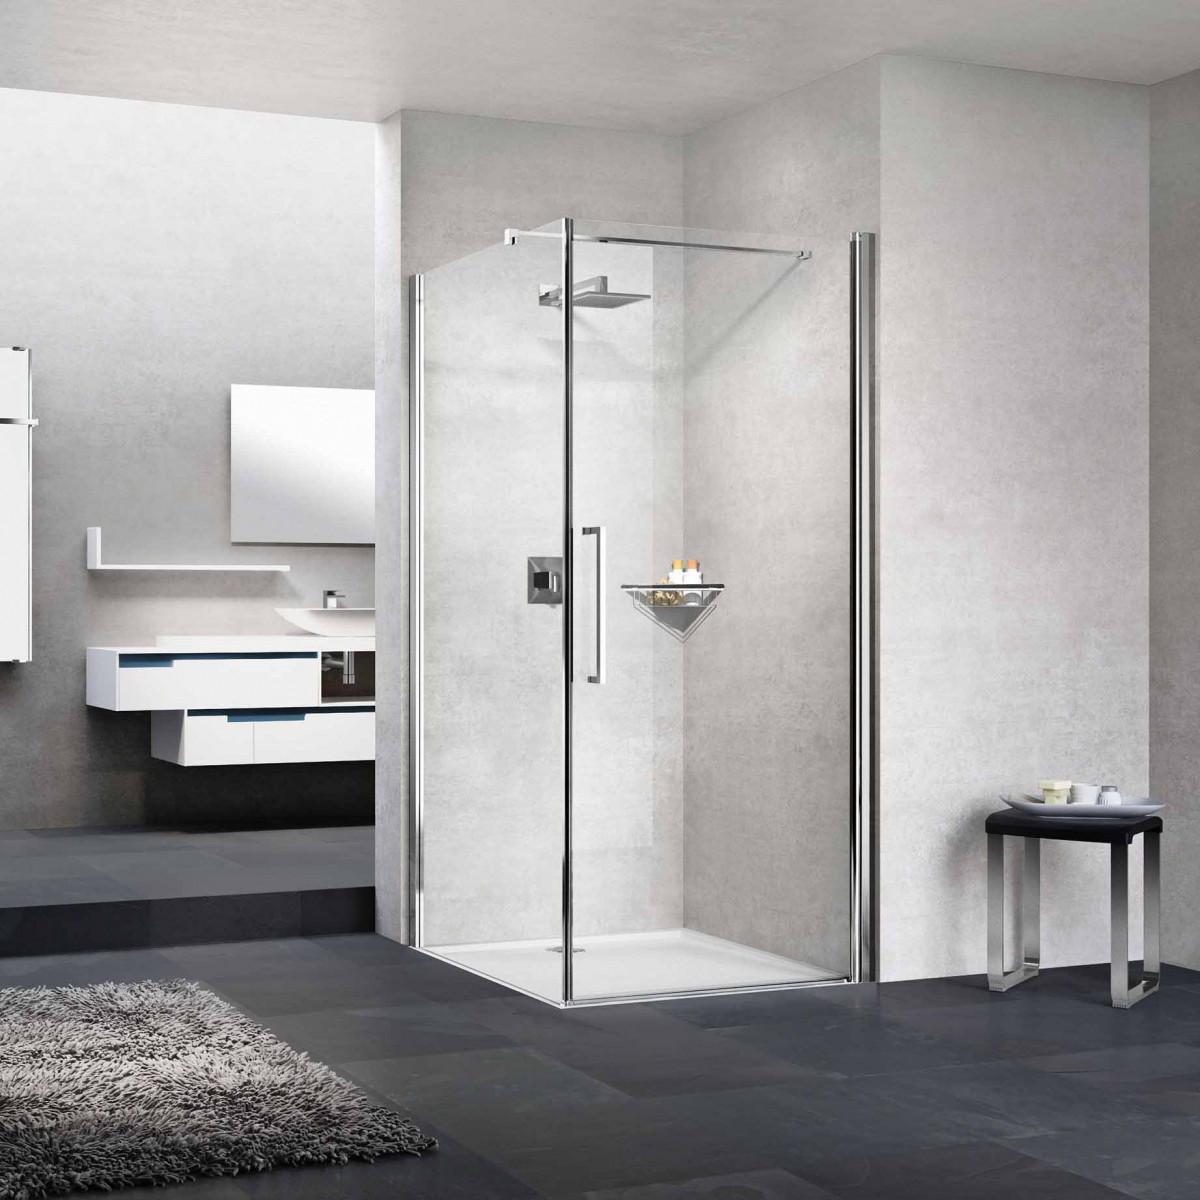 Novellini young hinged shower enclosure 970mm y2g851k for Novellini shower doors